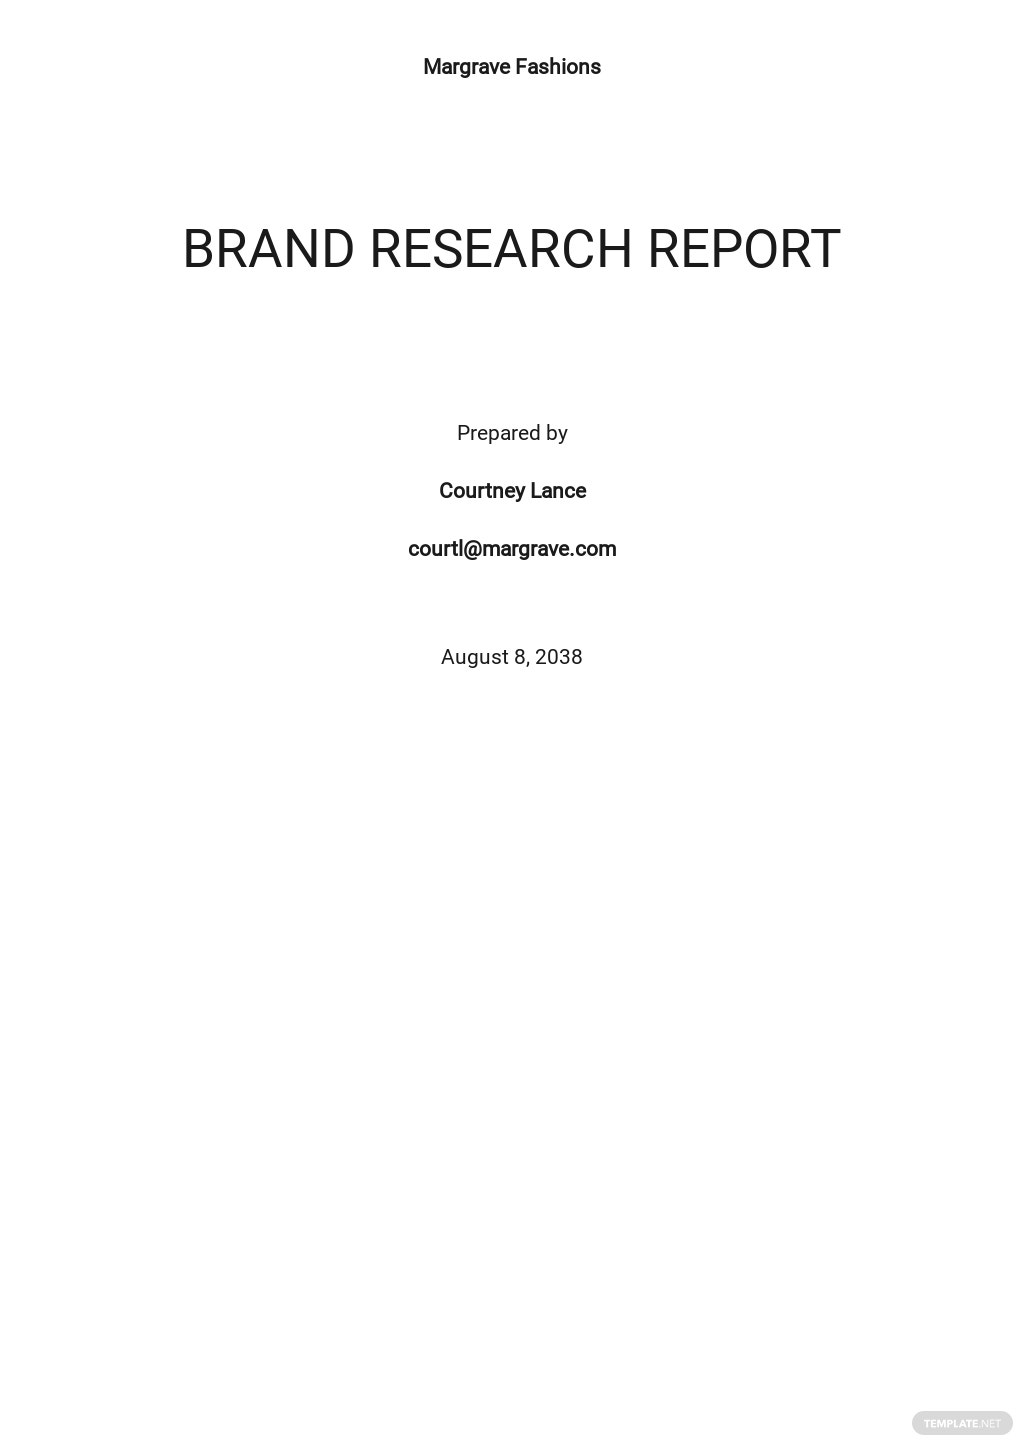 Brand Research Report Template.jpe